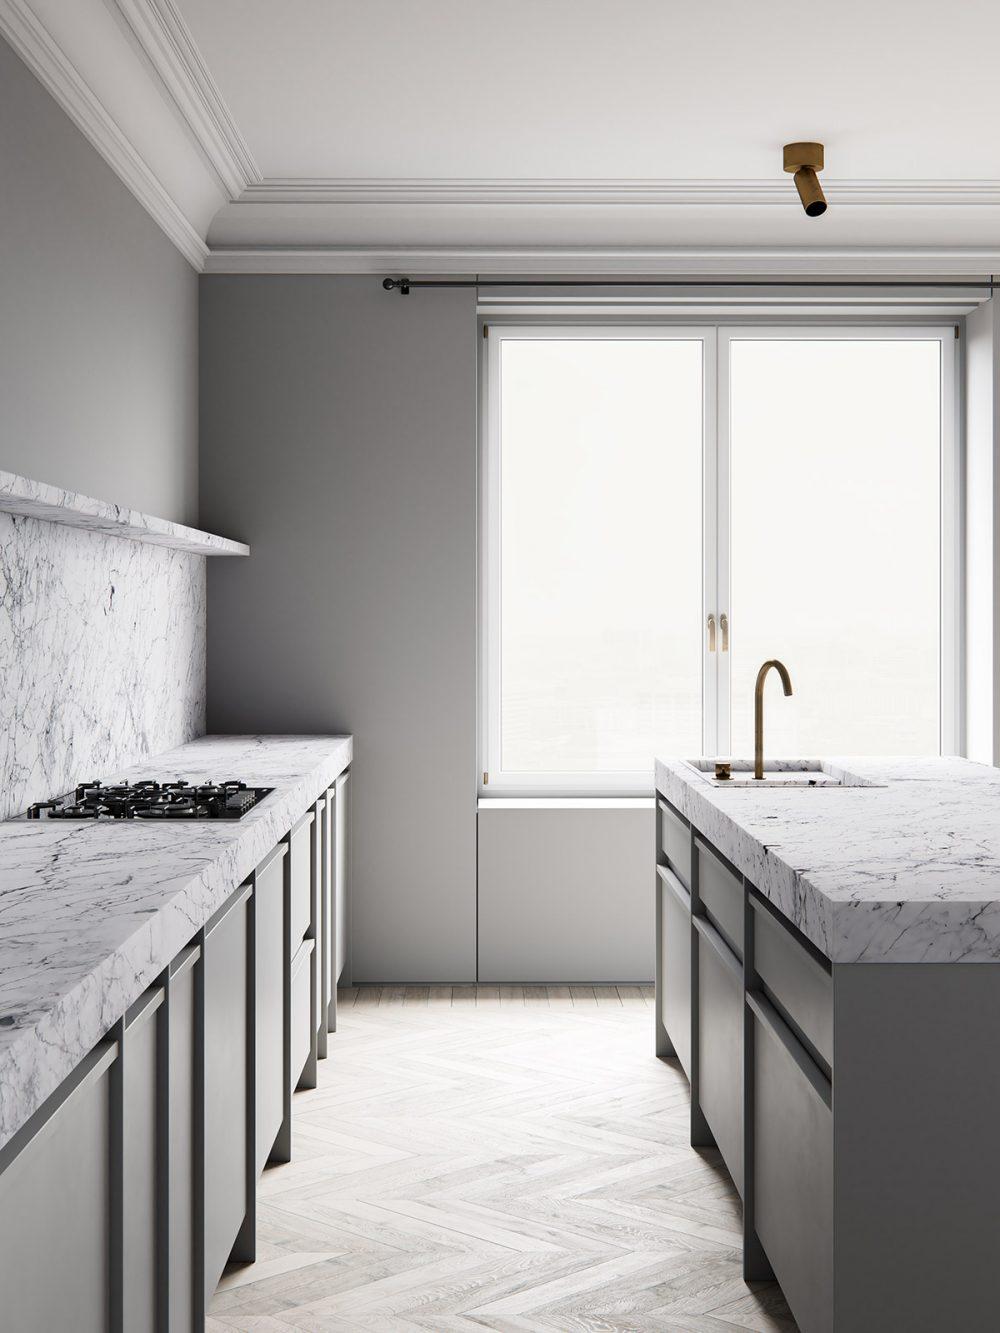 3d interior render. ScreenAge featured project - MIST Kitchen 2